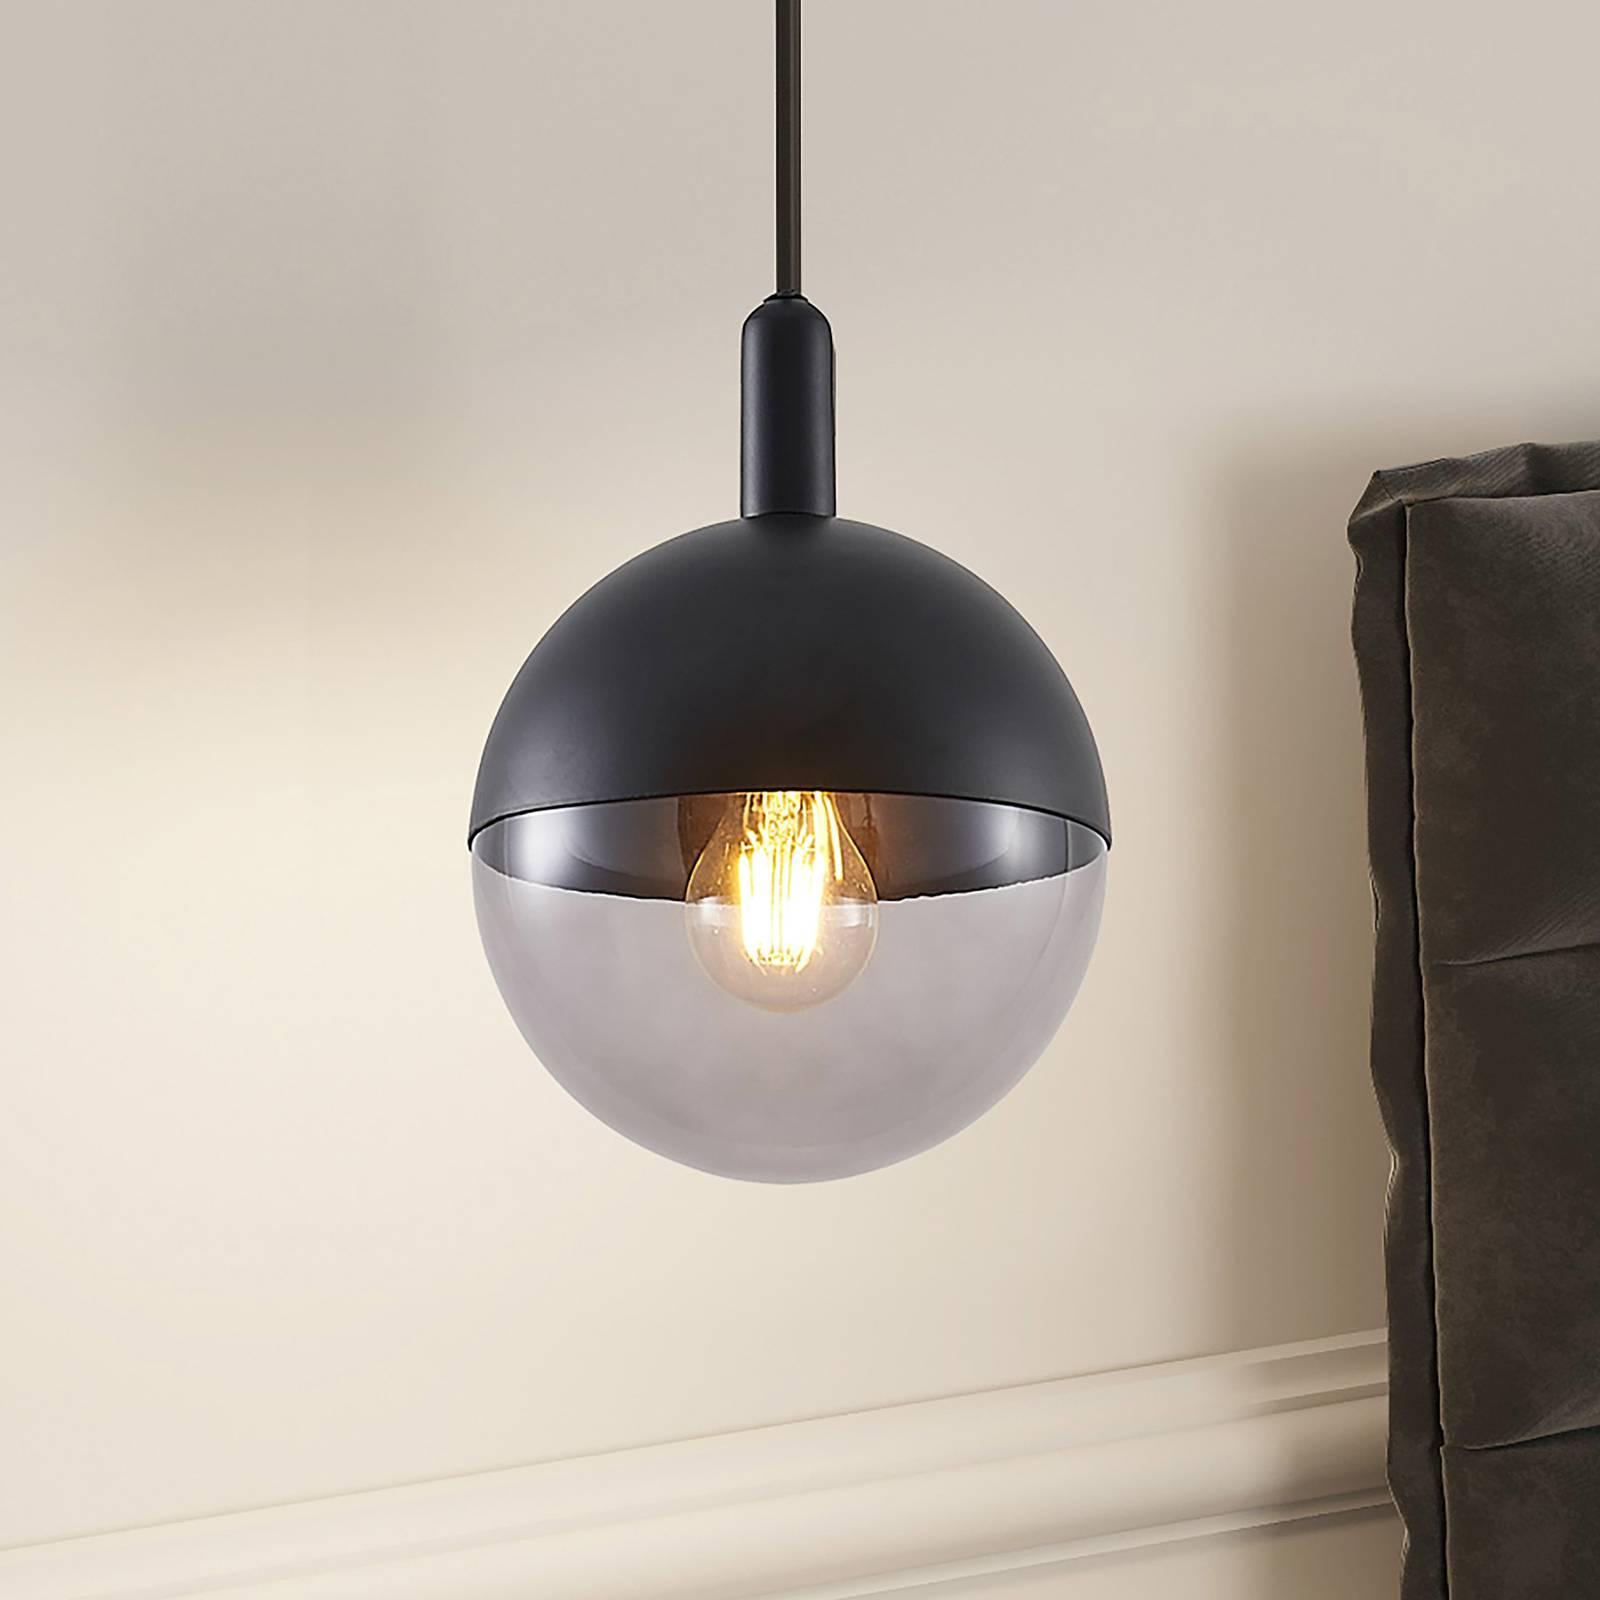 Lucande Dustian lampa wisząca, szklana kula